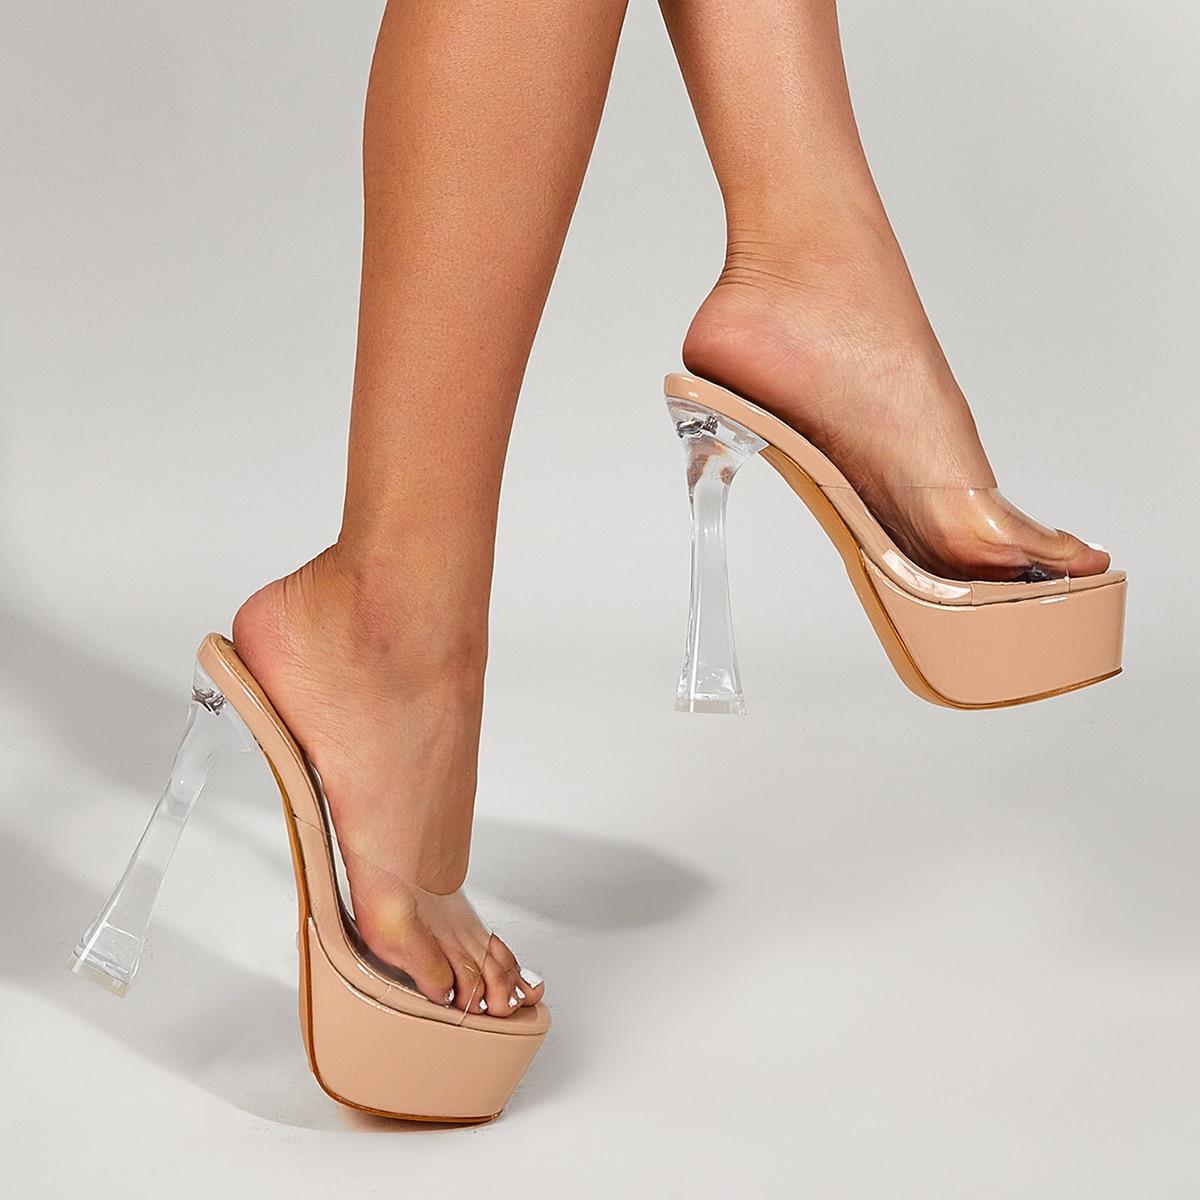 Прозрачные сандалии на платформе